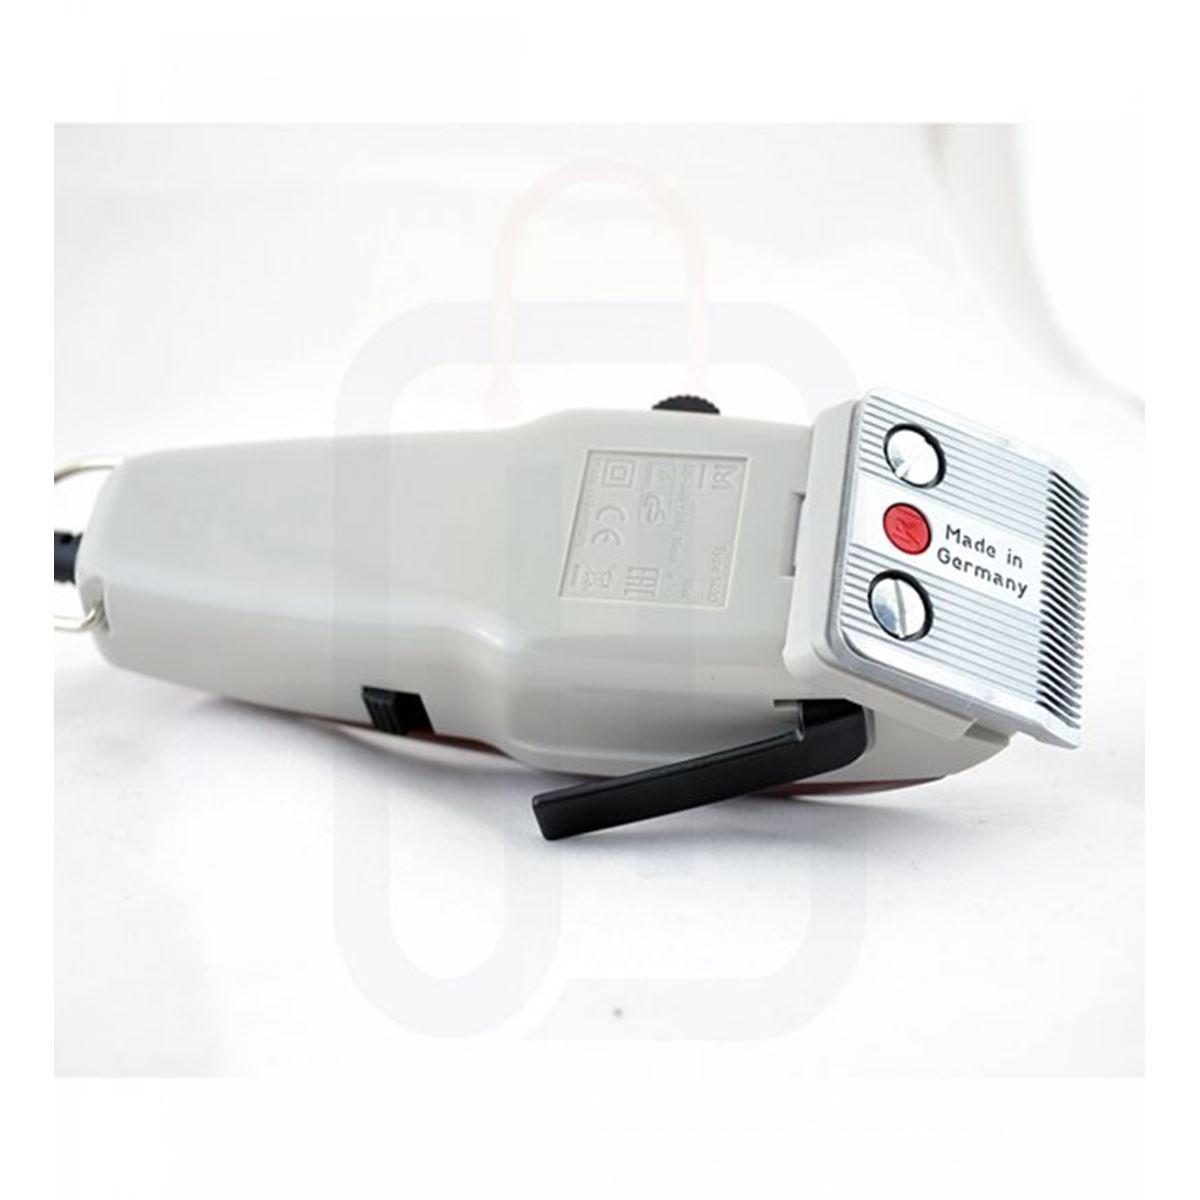 Moser 1400-0050 Profesyonel Saç Kesme Makinesi